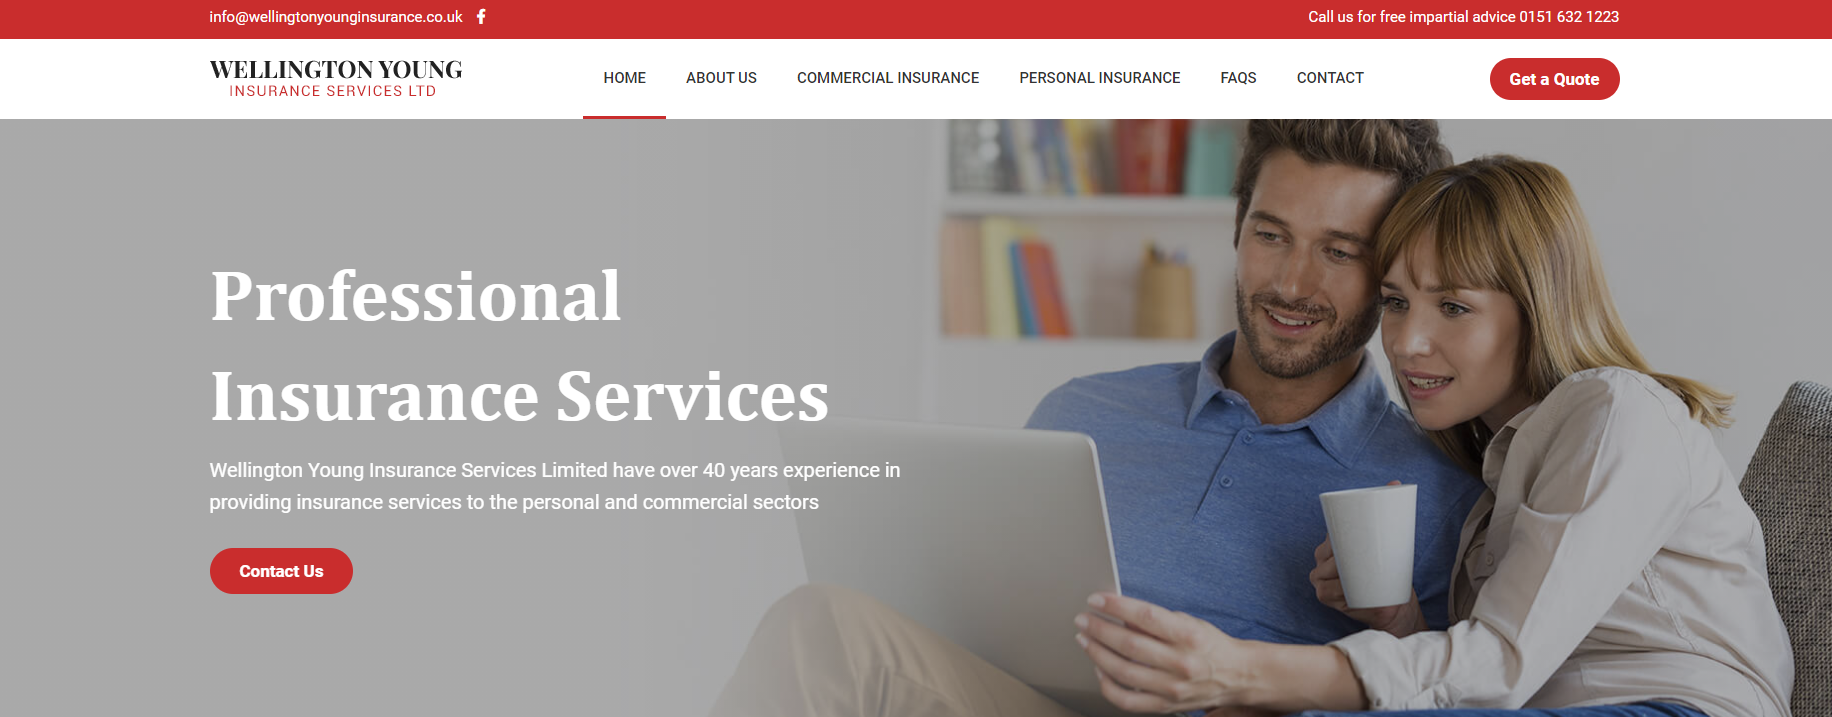 Wellington Young Insurance Services LTD